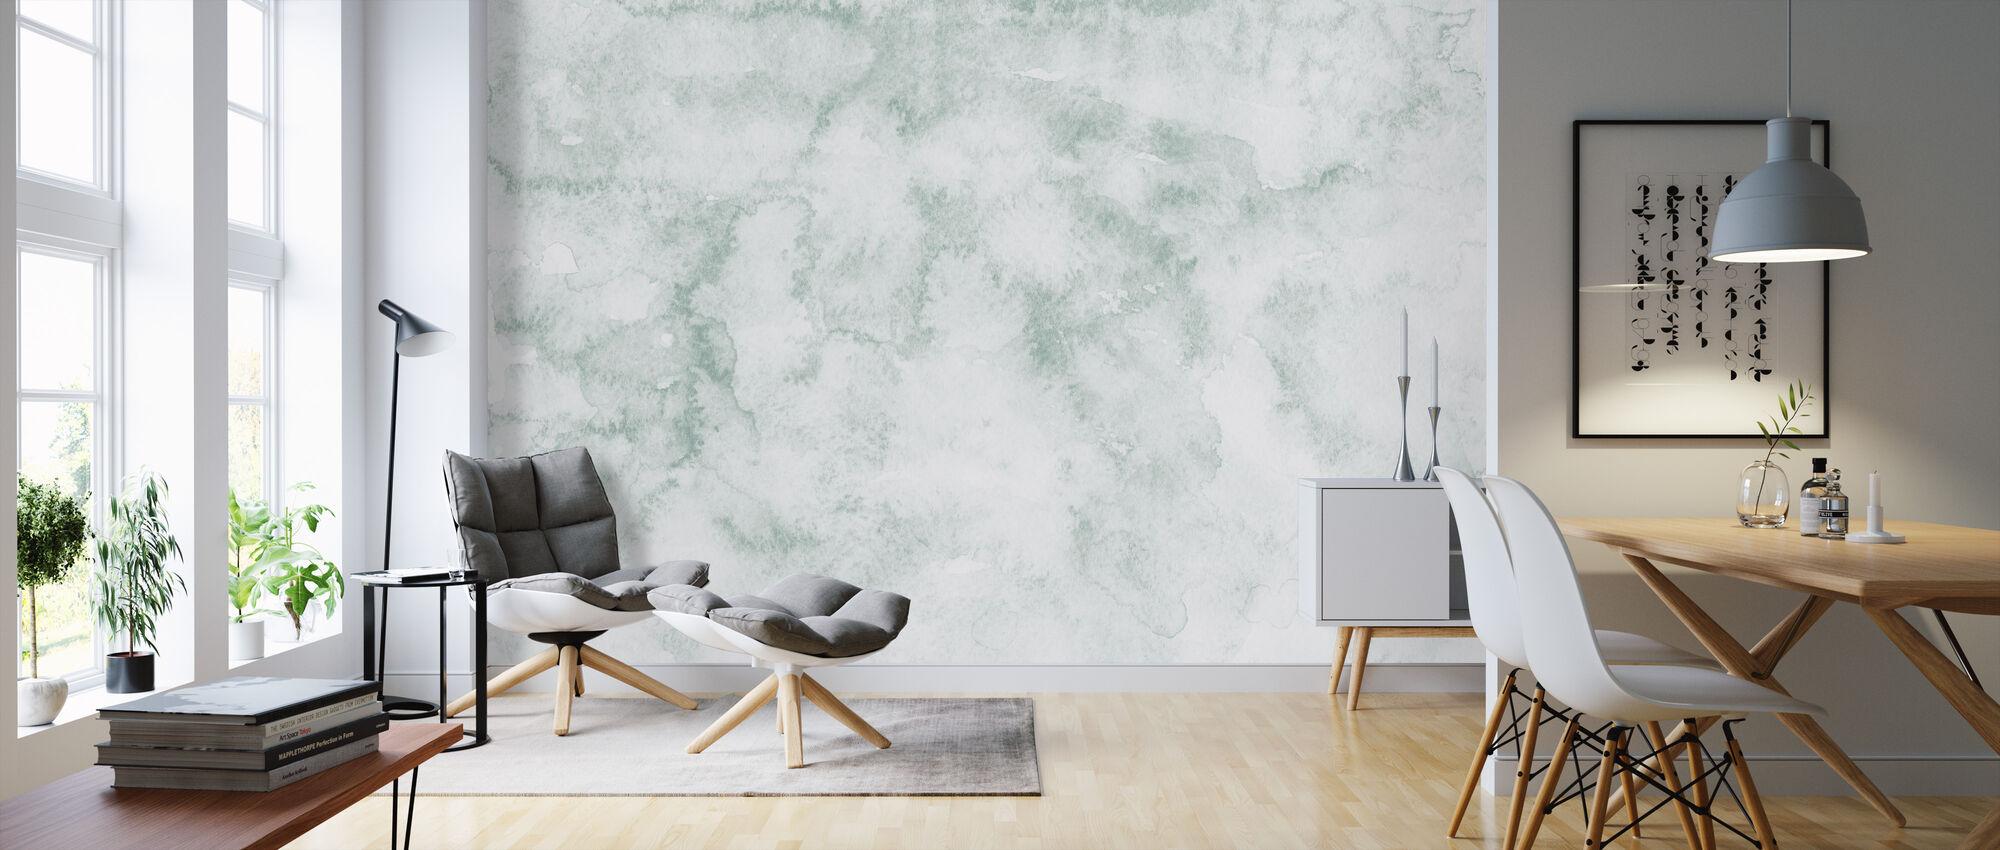 Watercolor Minimalism X - Wallpaper - Living Room